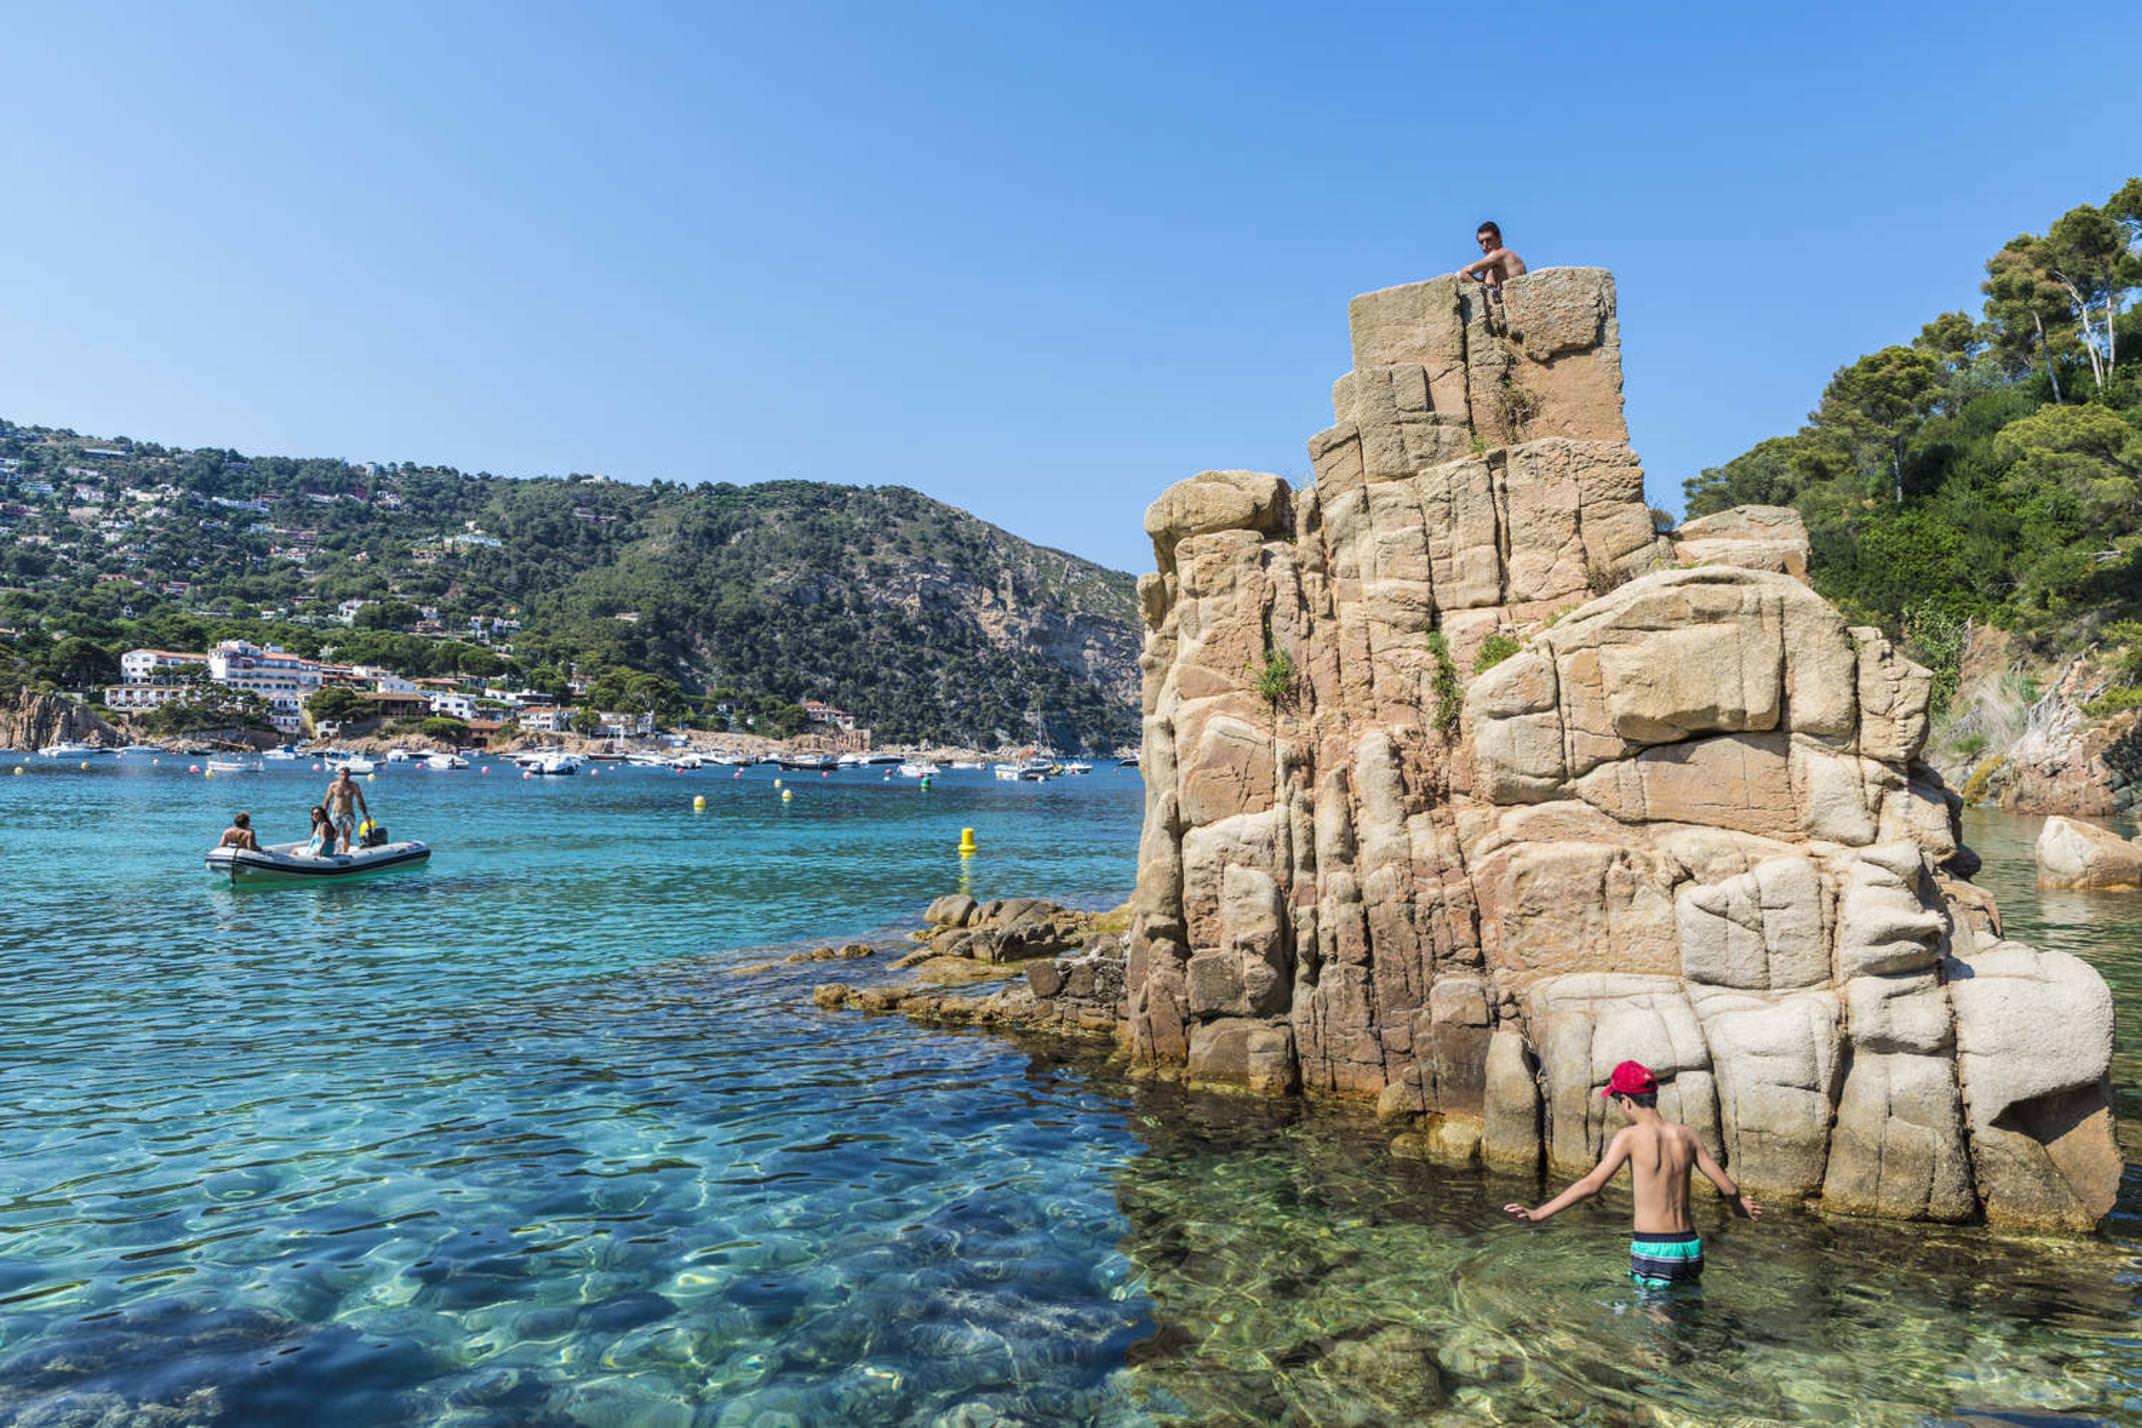 Spain catalonia aiguablava beach with sunbathers while a boat is heading to the beach in costa brava j2r